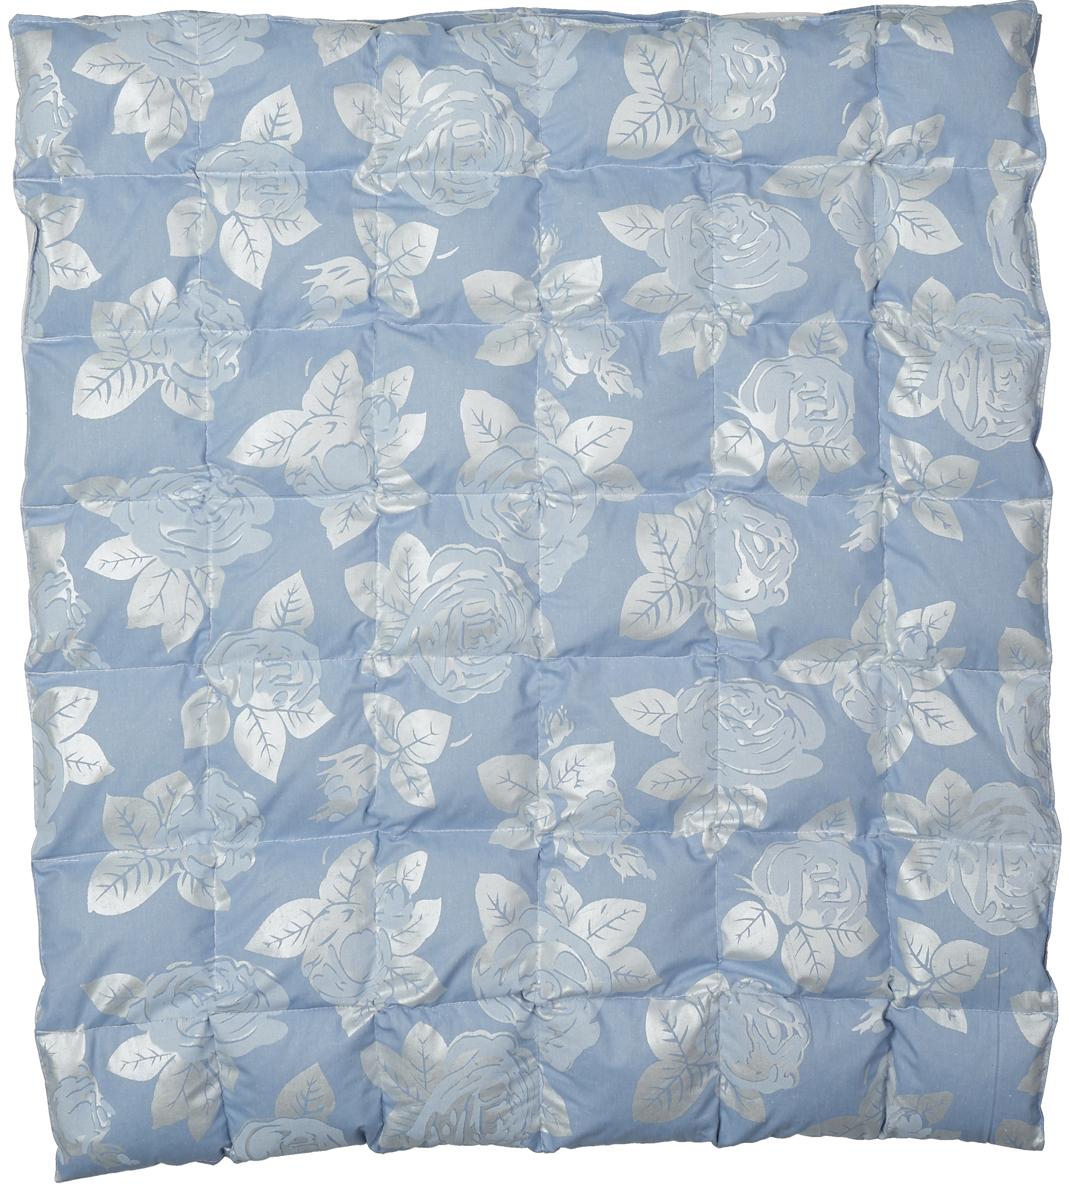 Наматрасник Bio-Textiles, наполнитель: лузга гречихи, 60 х 140 смNAL893